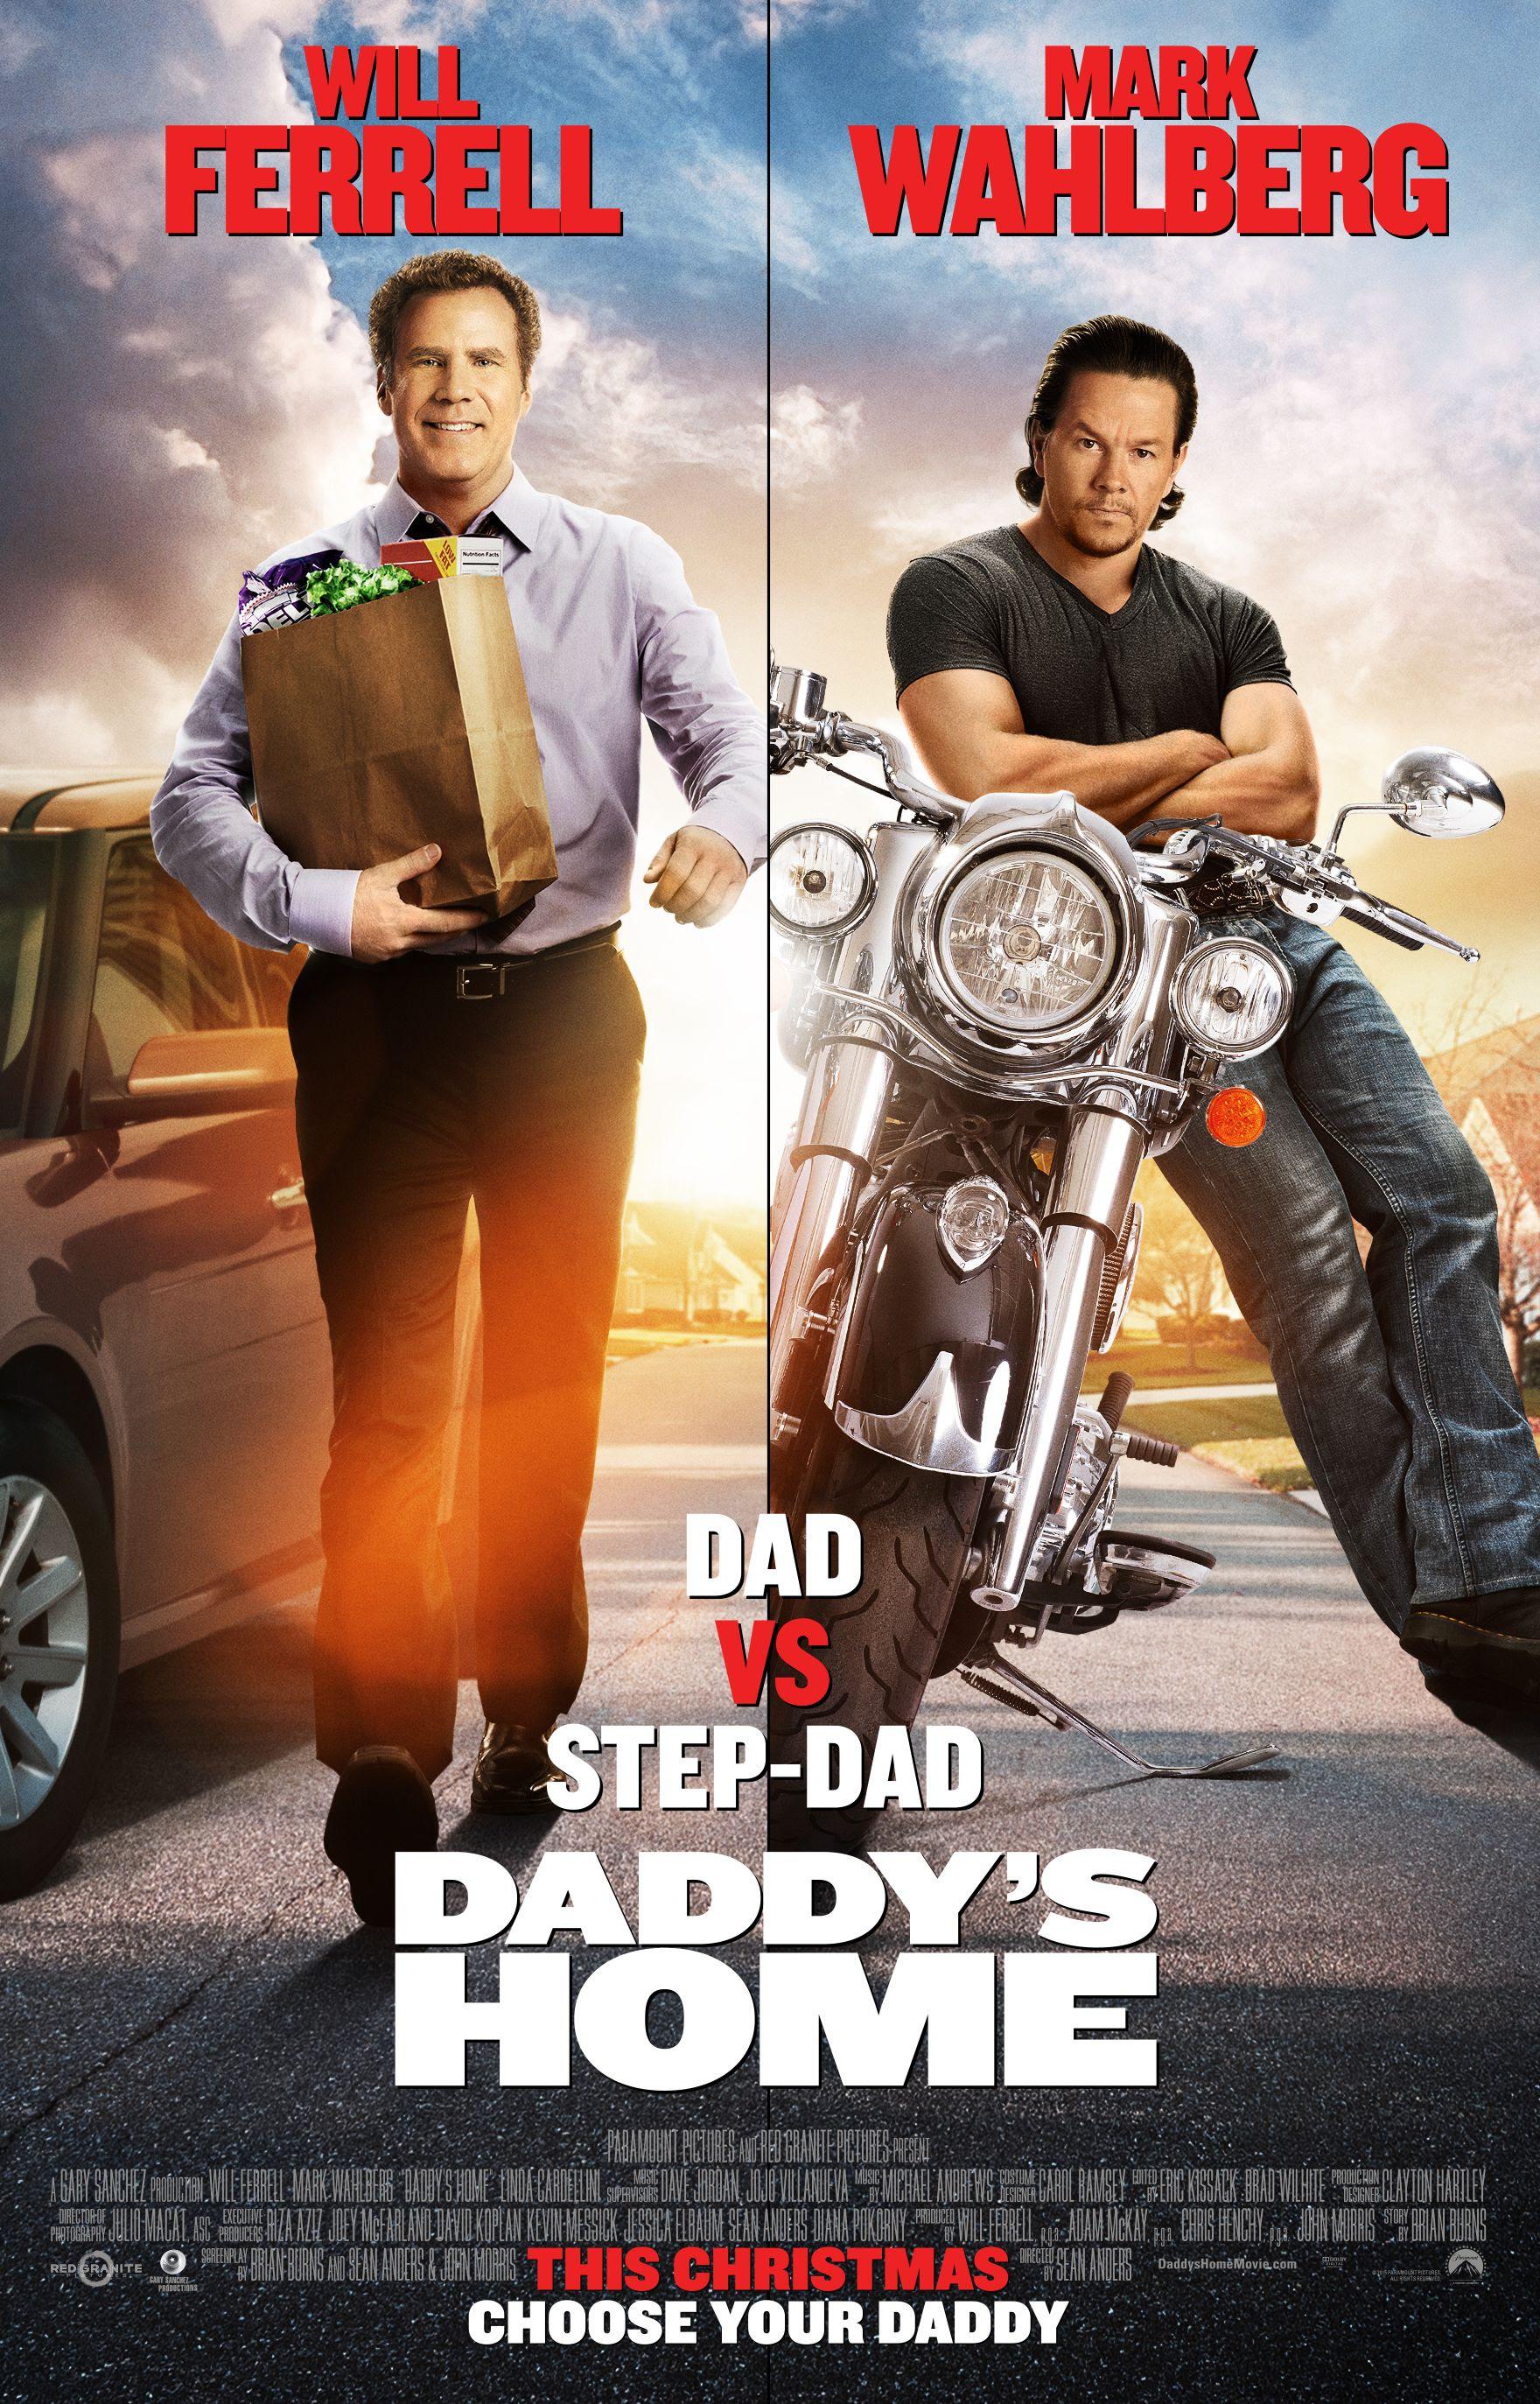 http://cdn.collider.com/wp-content/uploads/2015/10/daddys-home-poster.jpg